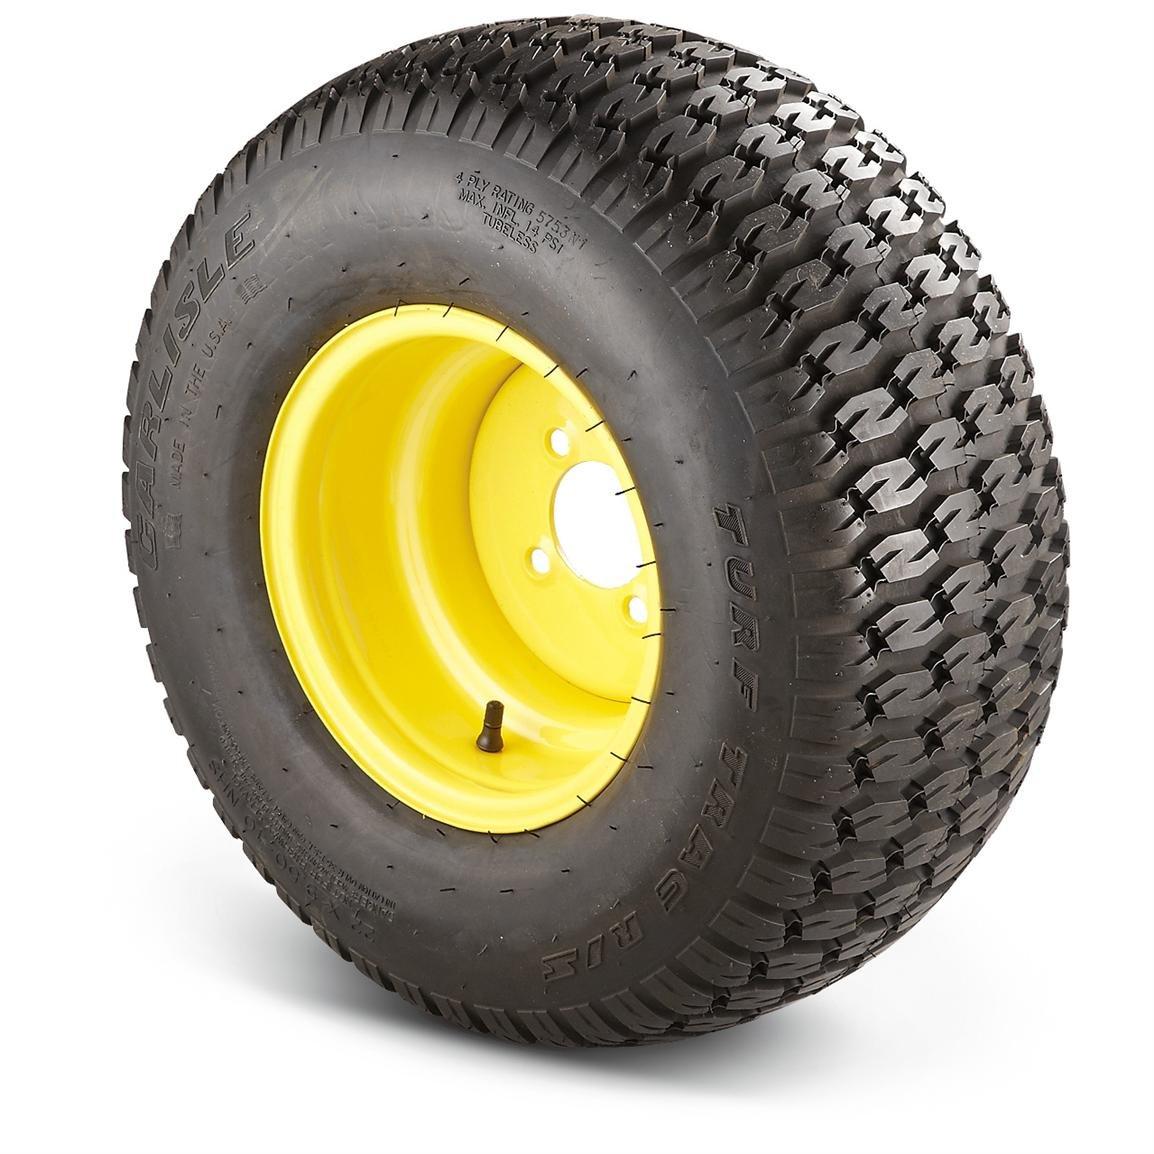 Carlisle Turf Pro R3 Tractor Tire -13.6-16